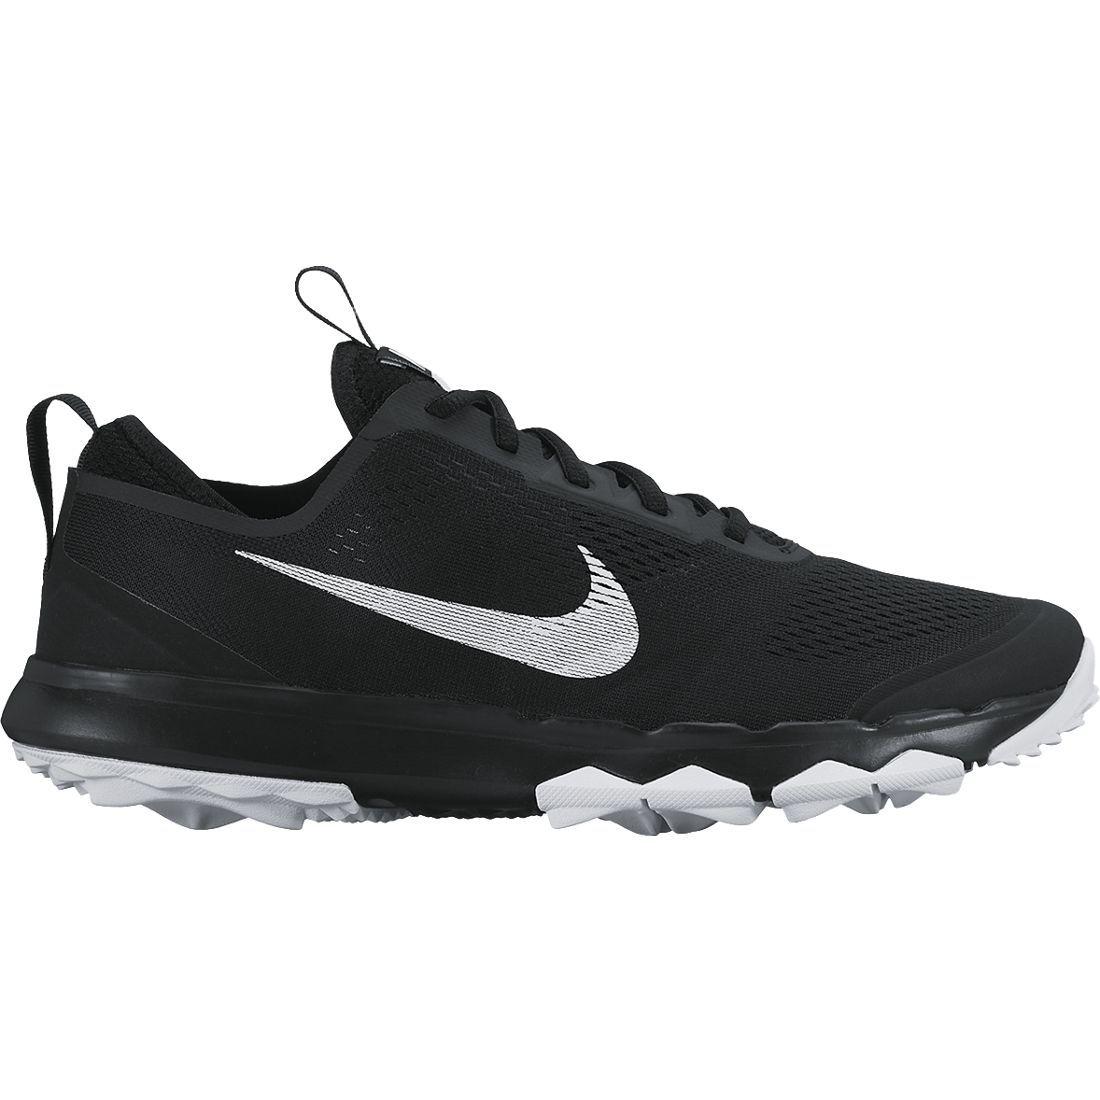 Buy Nike FI Bermuda Golf Shoes Black